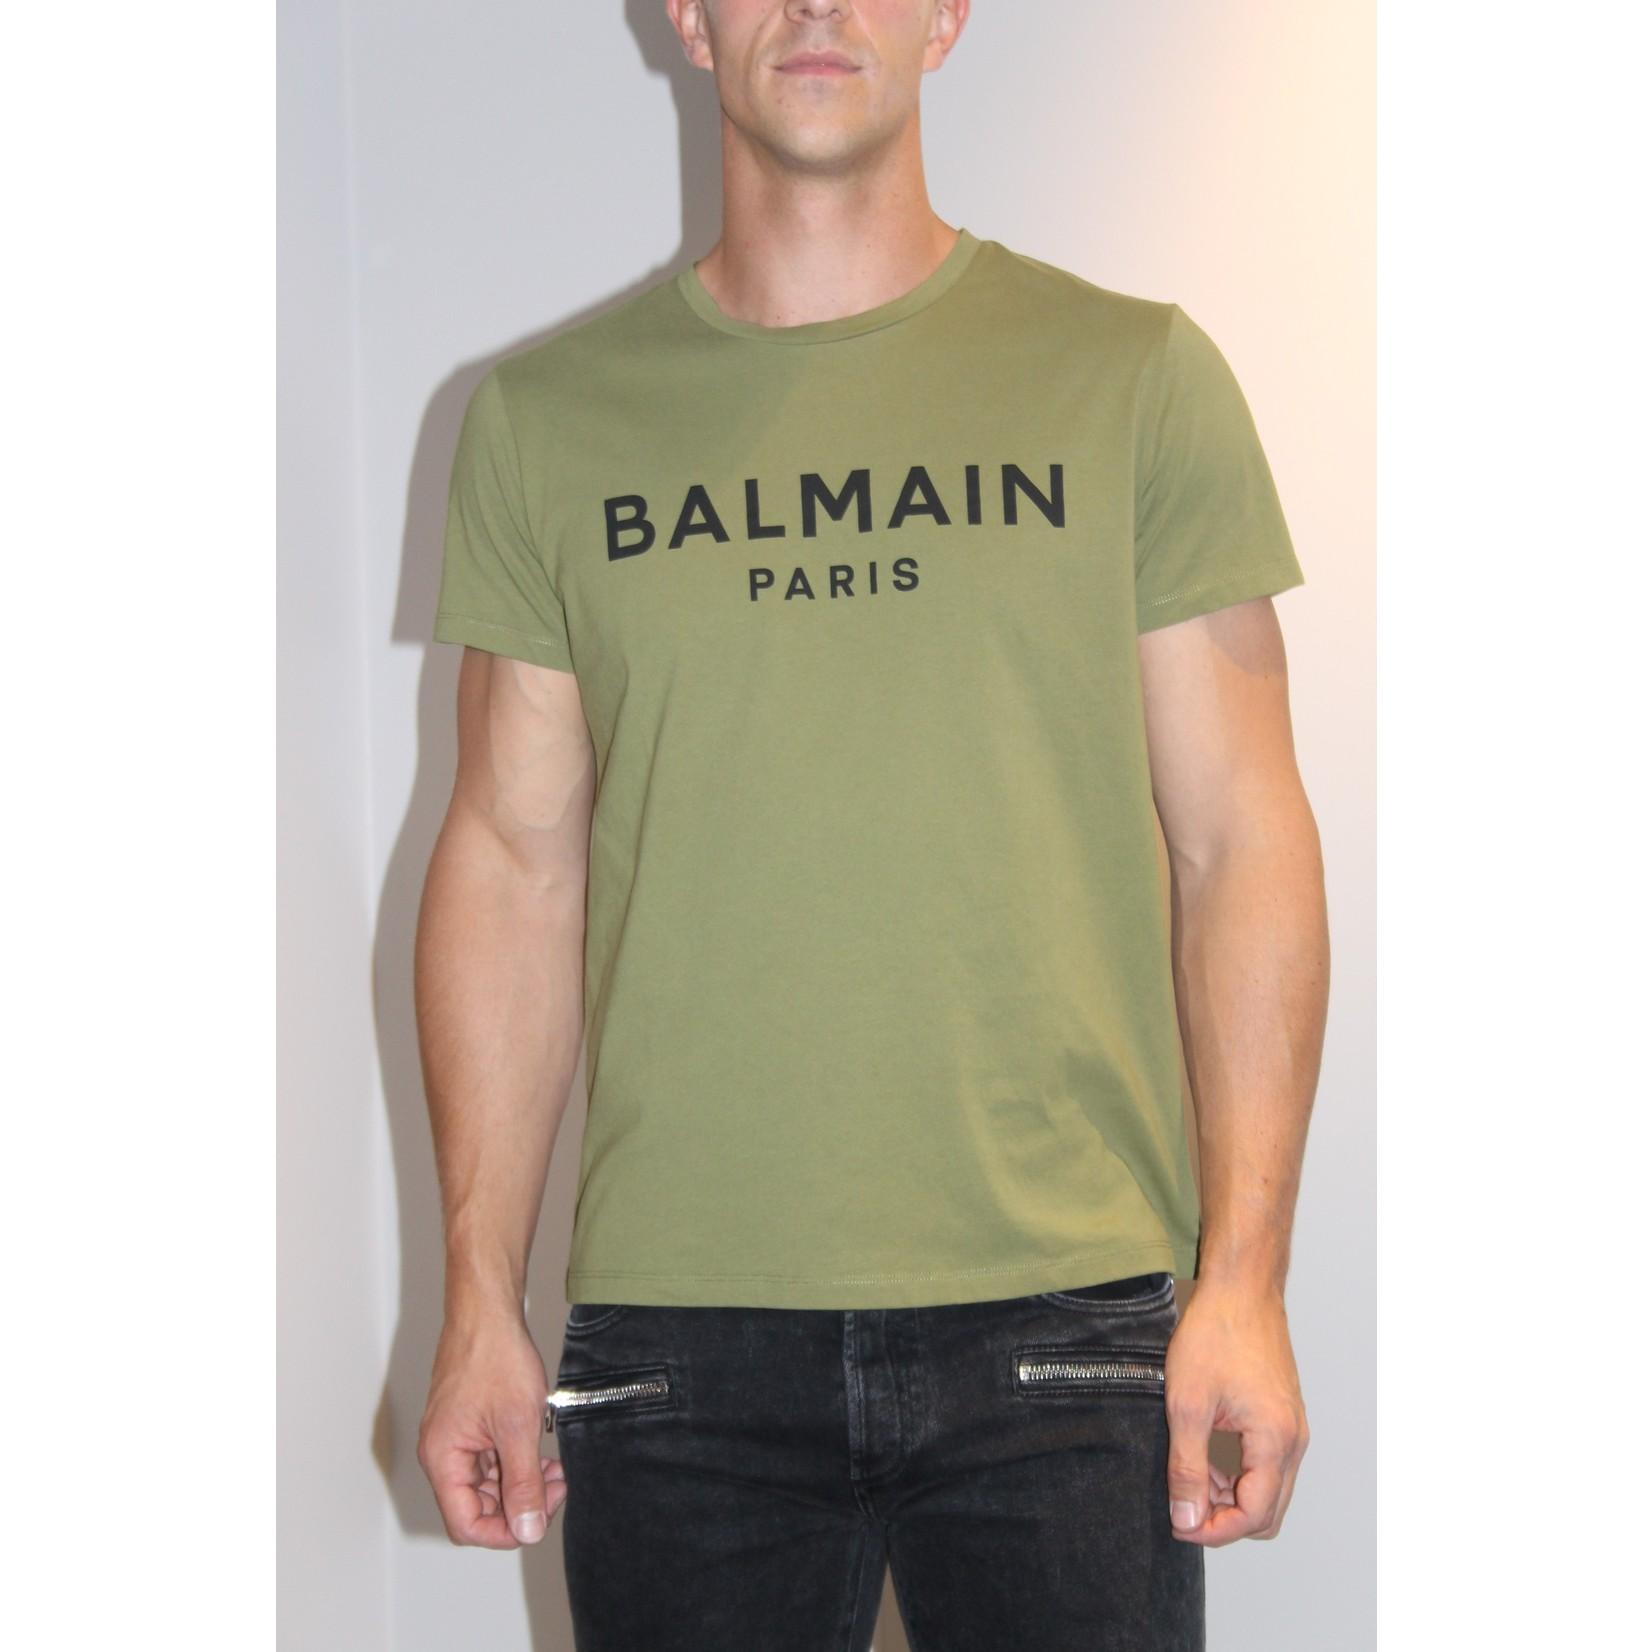 BALMAIN T-Shirt 42804